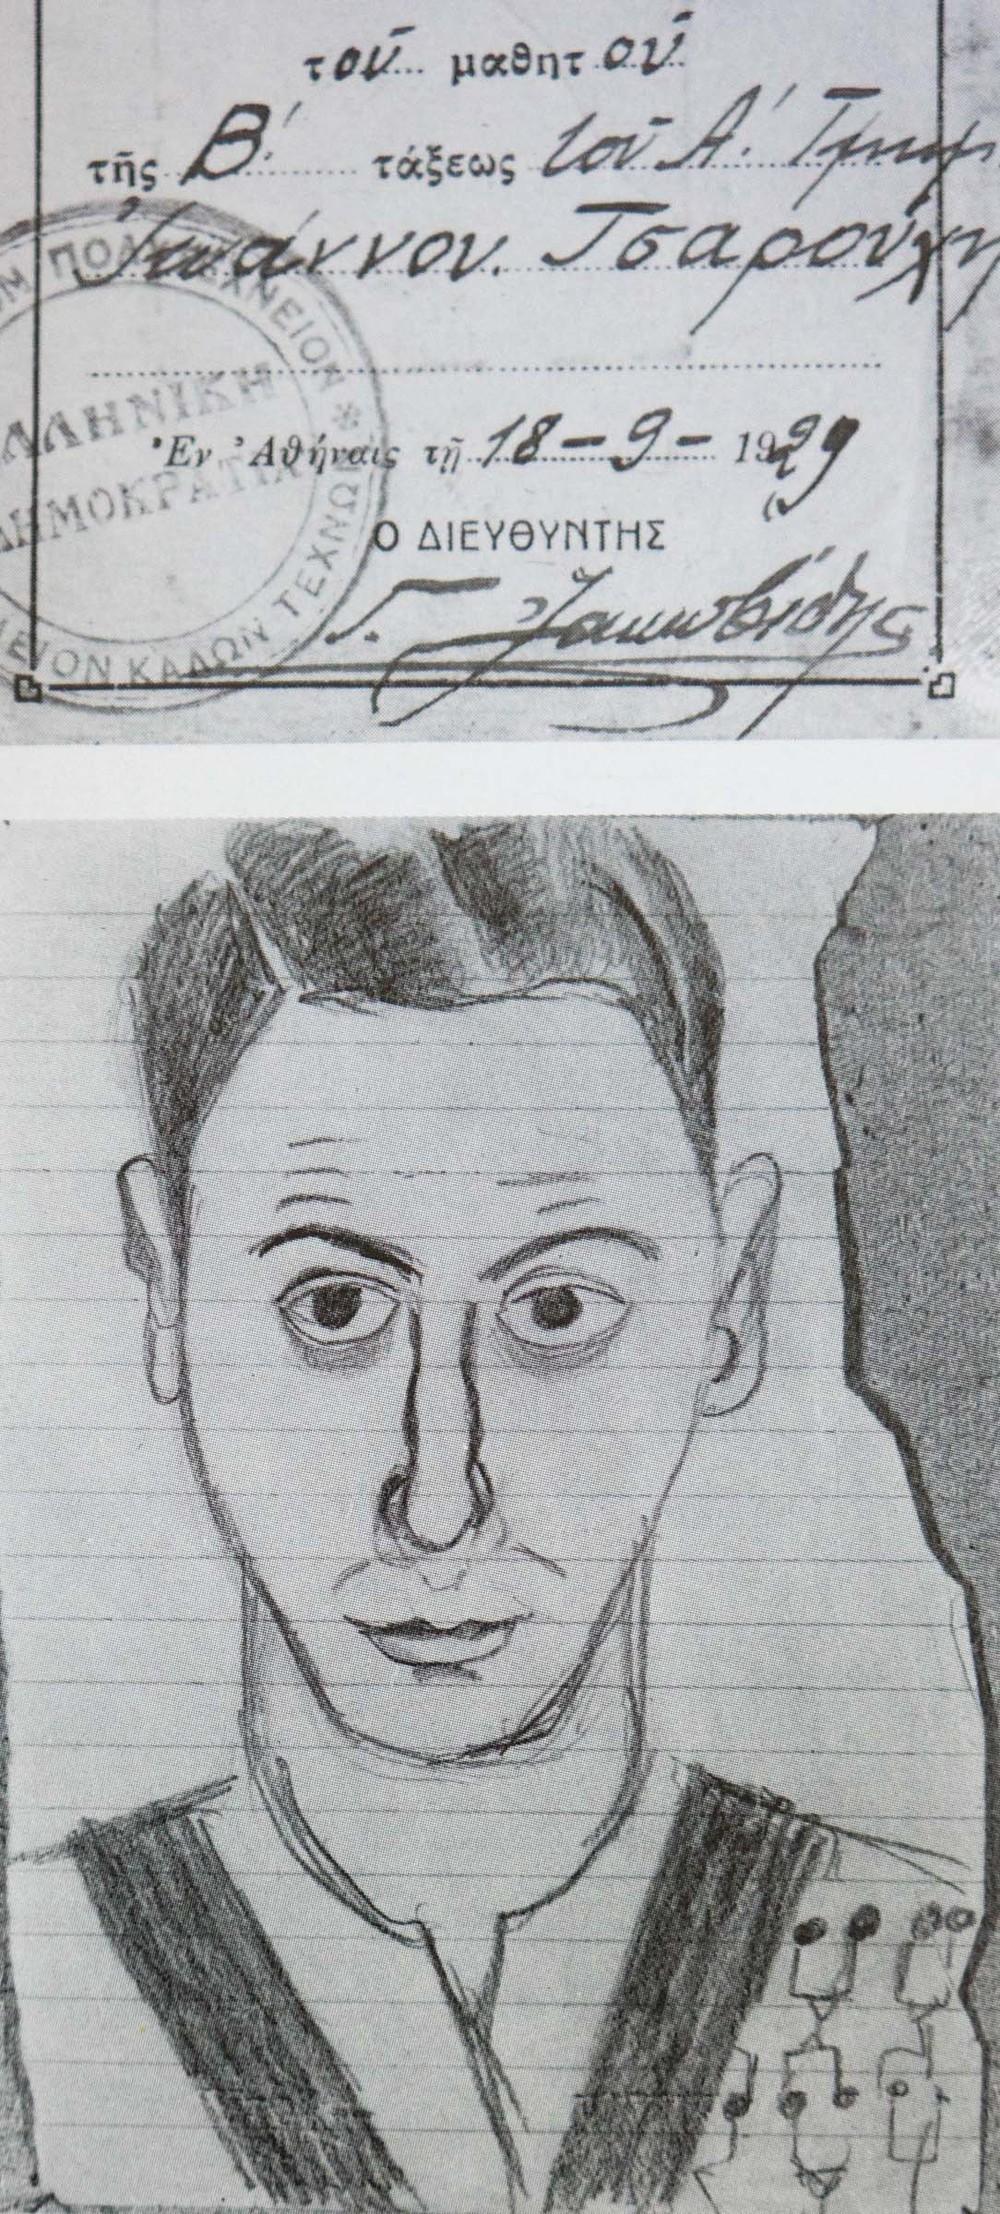 tsarouchis self portrait as a student